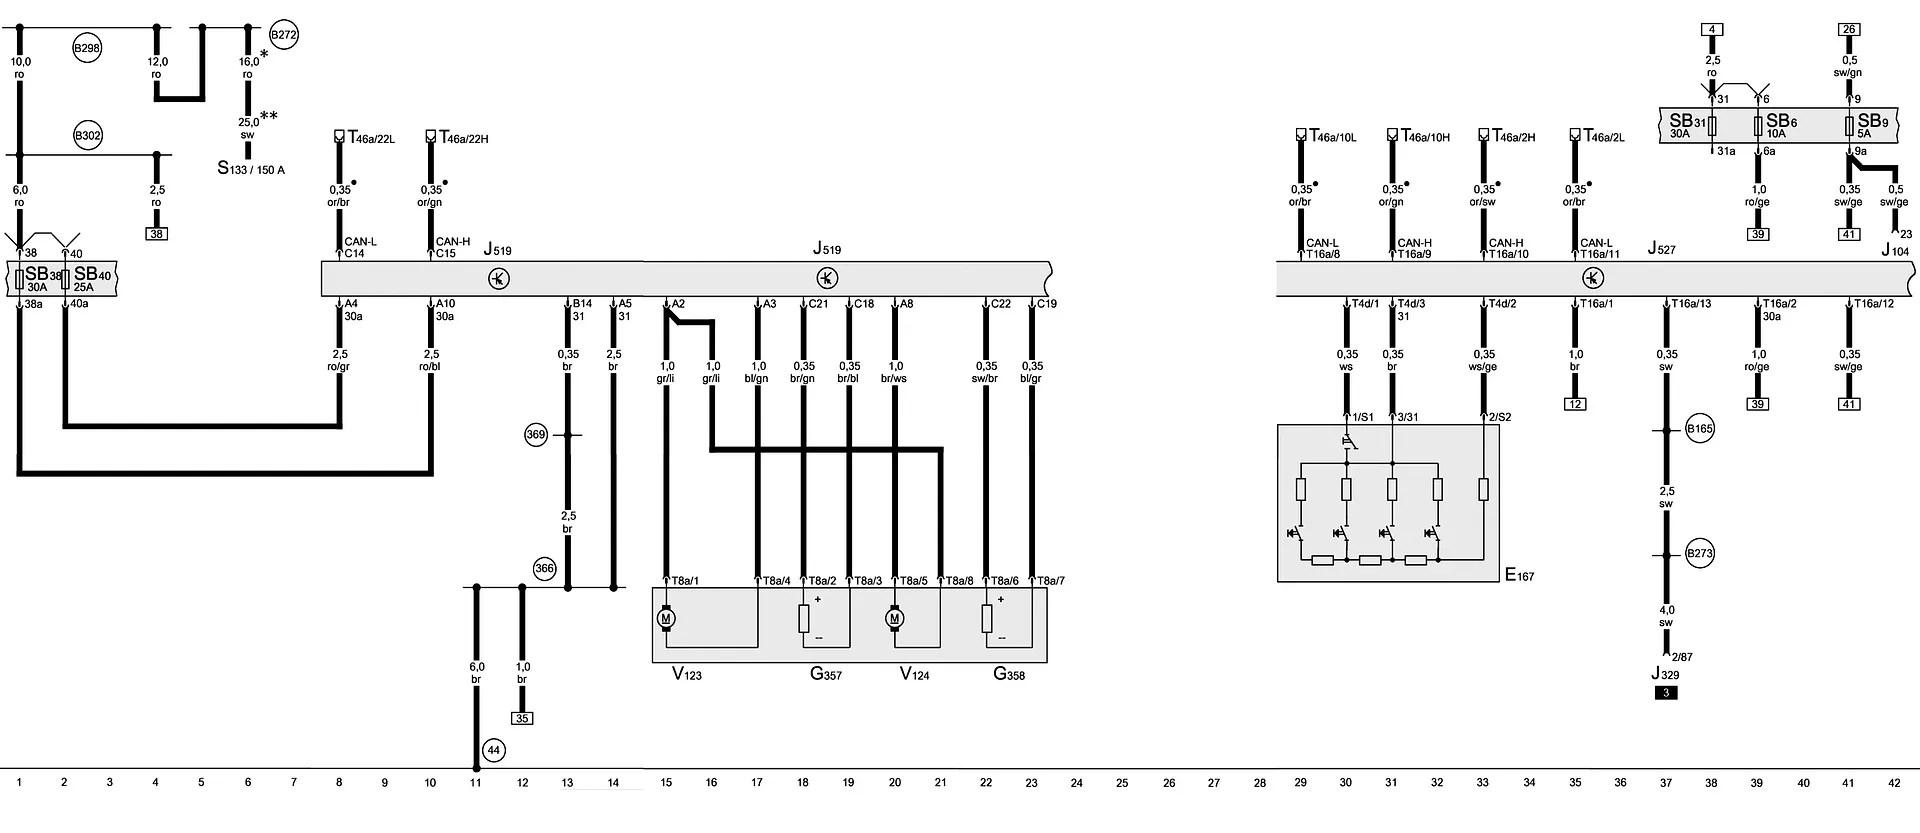 Skoda Octavia Towbar Wiring Diagram : 35 Wiring Diagram